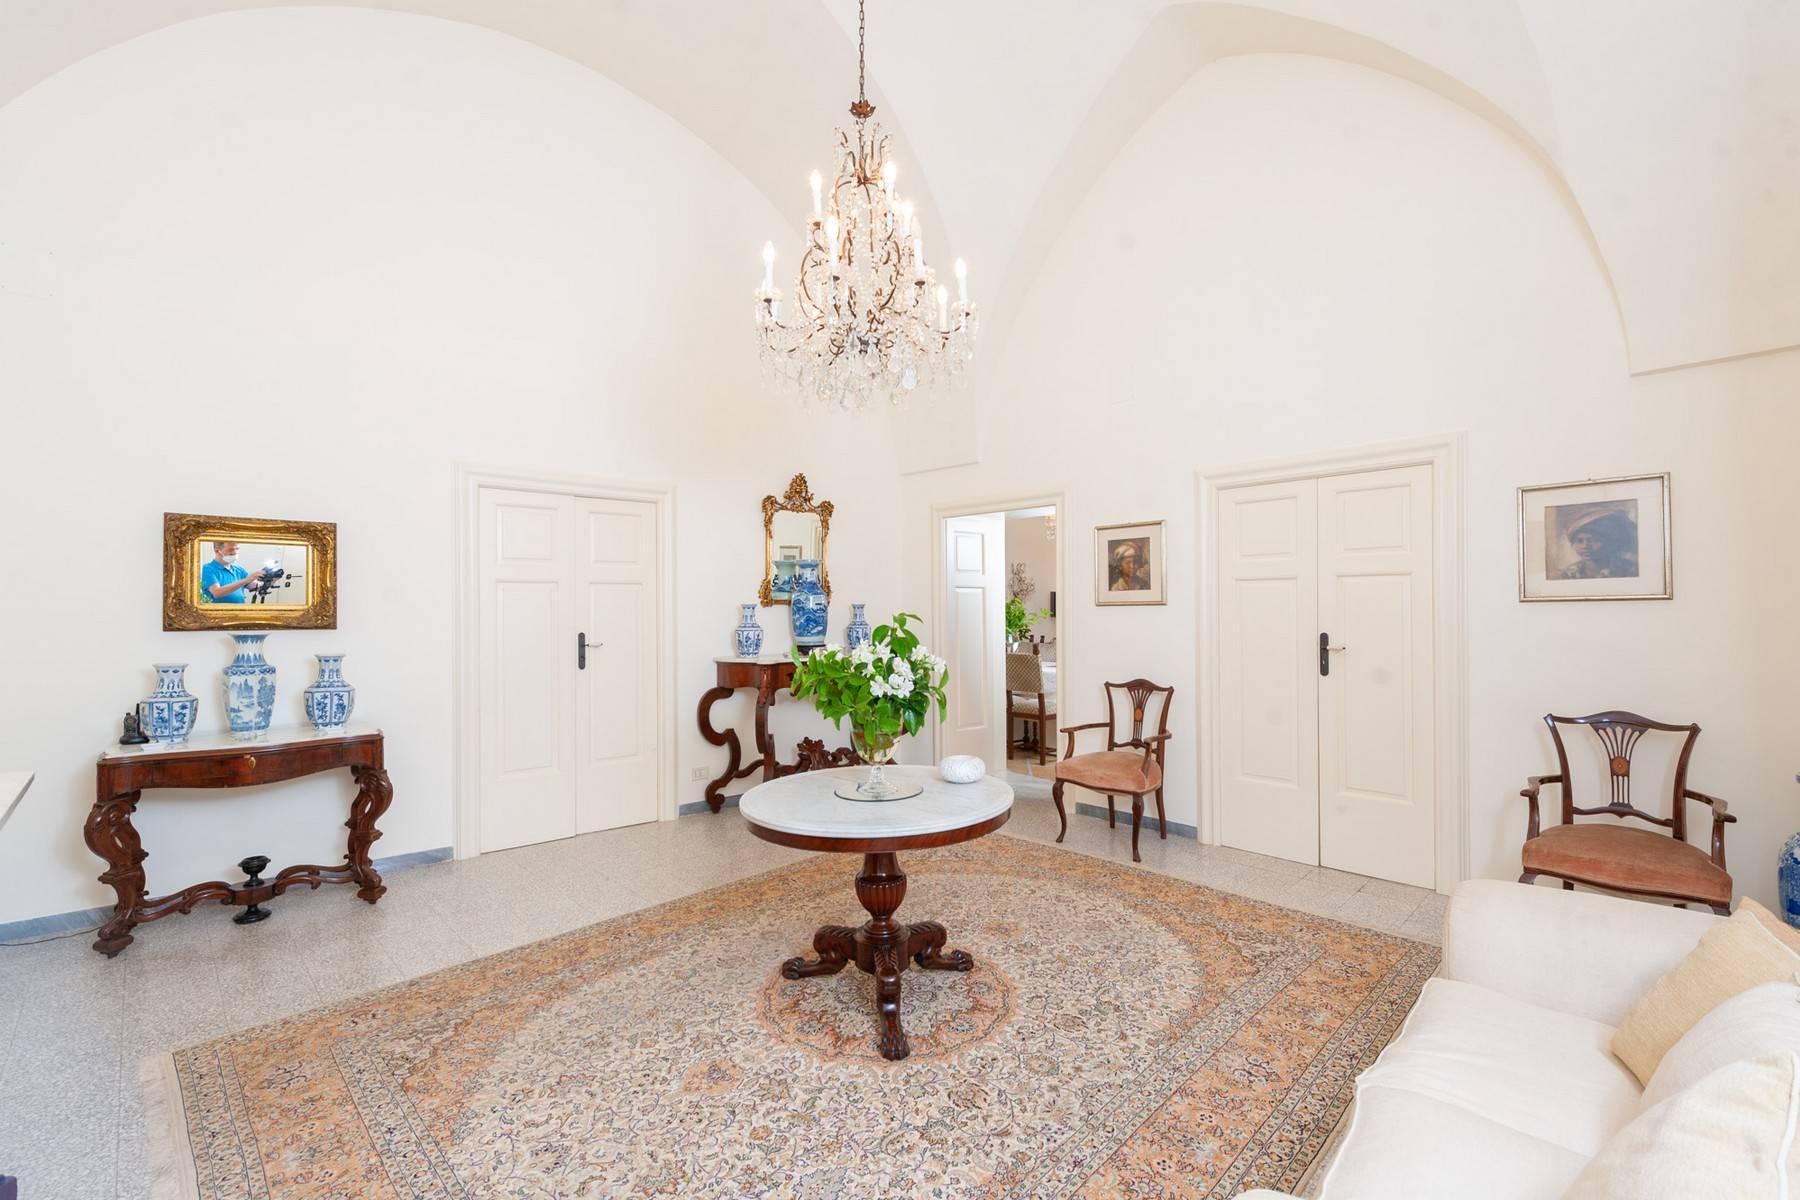 Splendida villa gentilizia del '600 circondata da agrumeti - 31